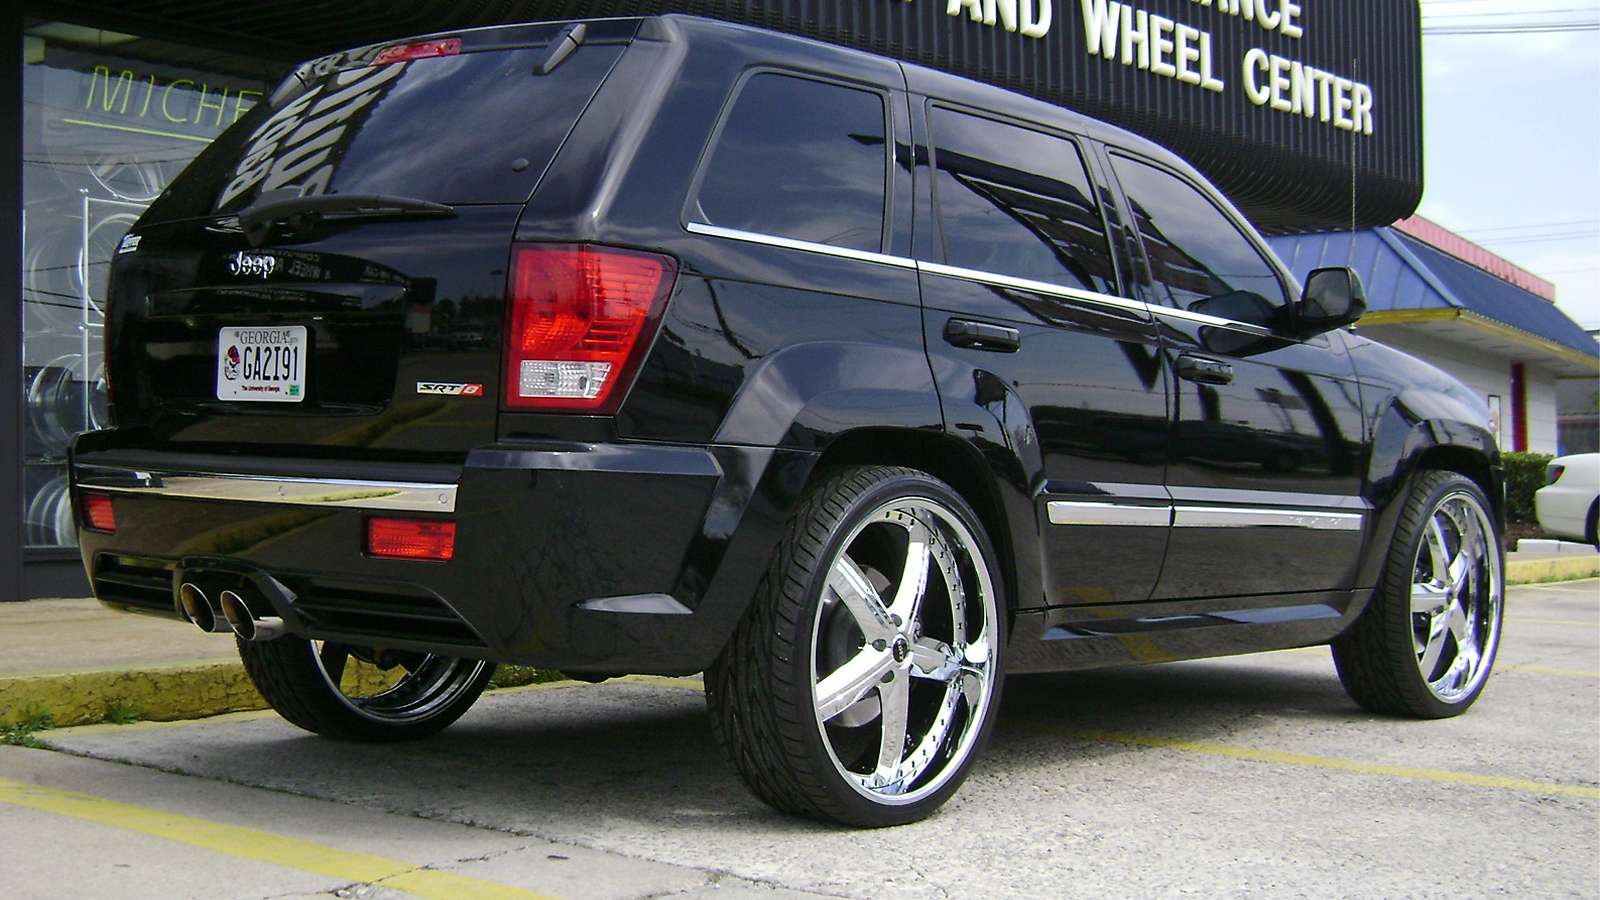 Jeep srt8 lease autos post for James hodge motor company paris texas